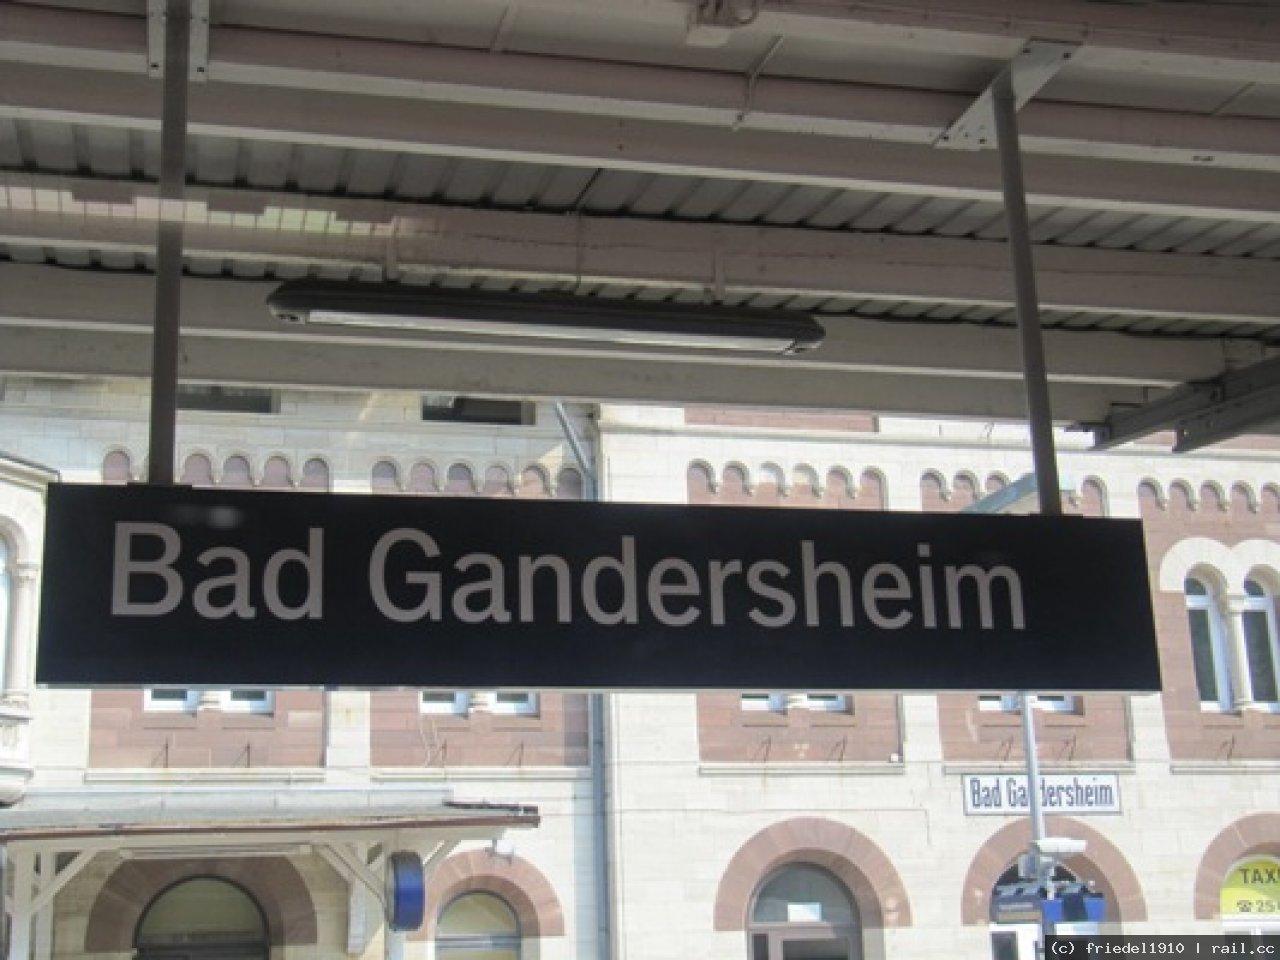 Bahnhof Bad Gandersheim | railcc